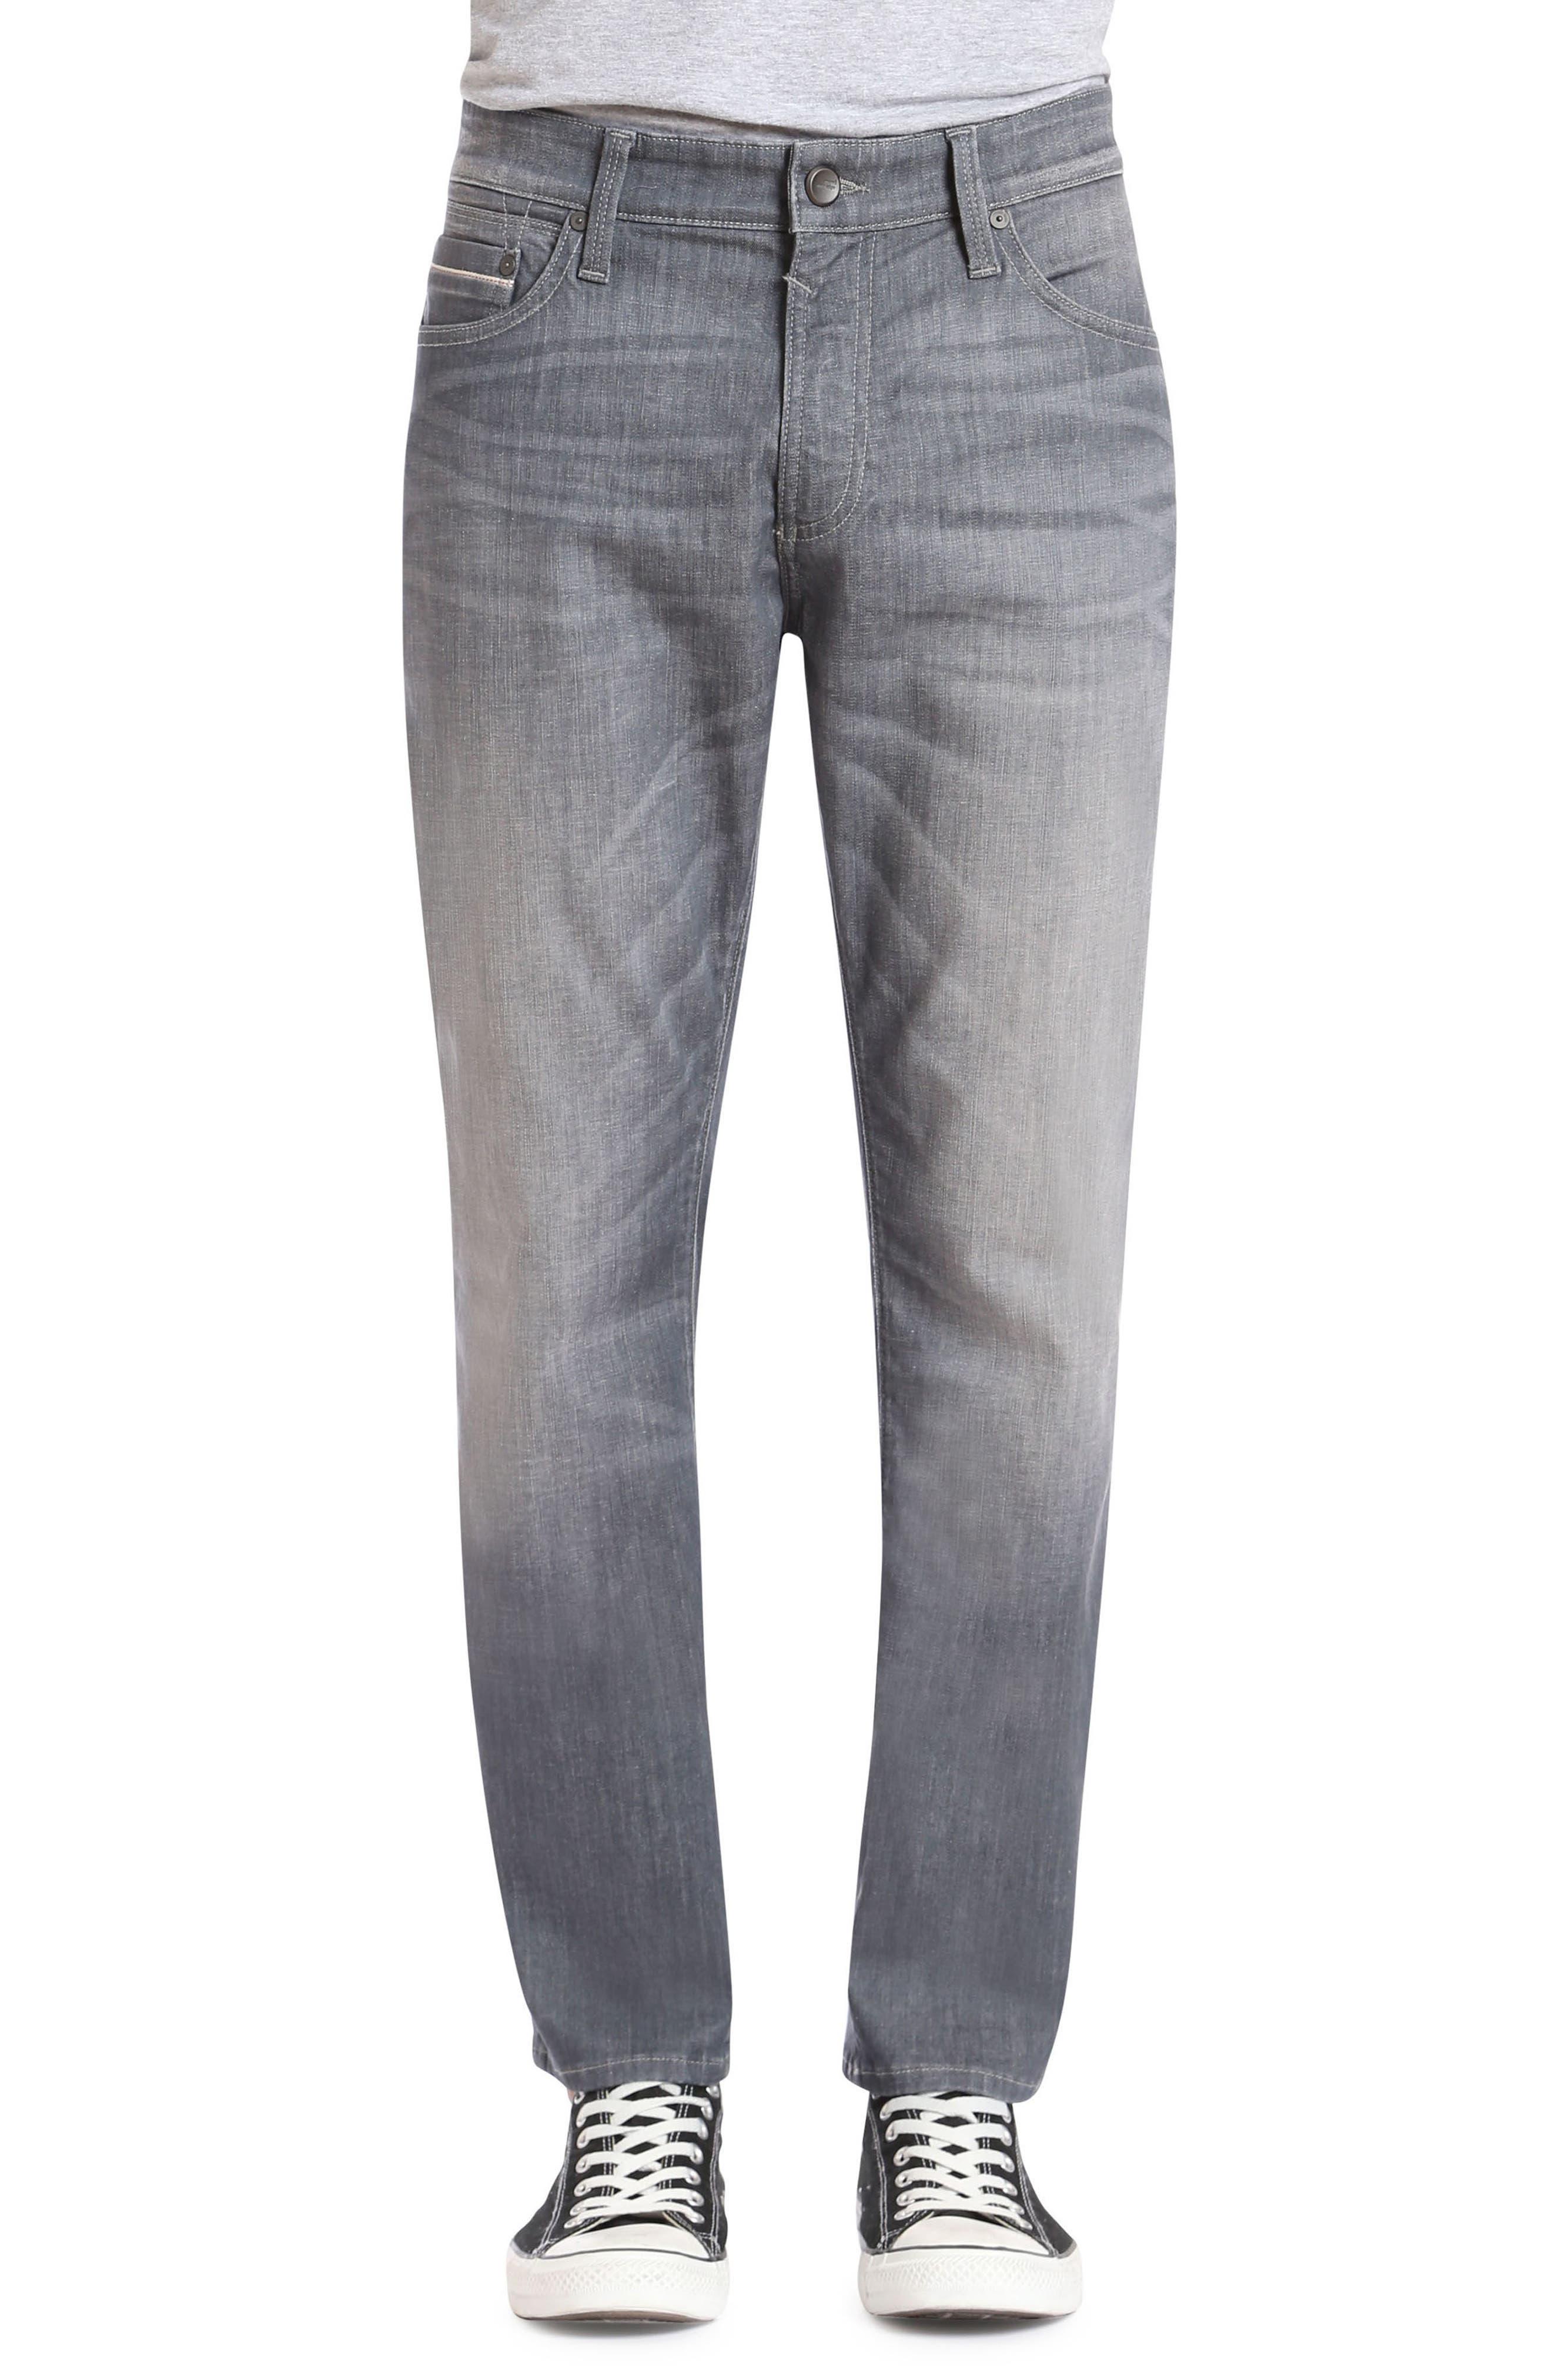 Marcus Slim Straight Leg Jeans,                         Main,                         color, Light Grey White Edge